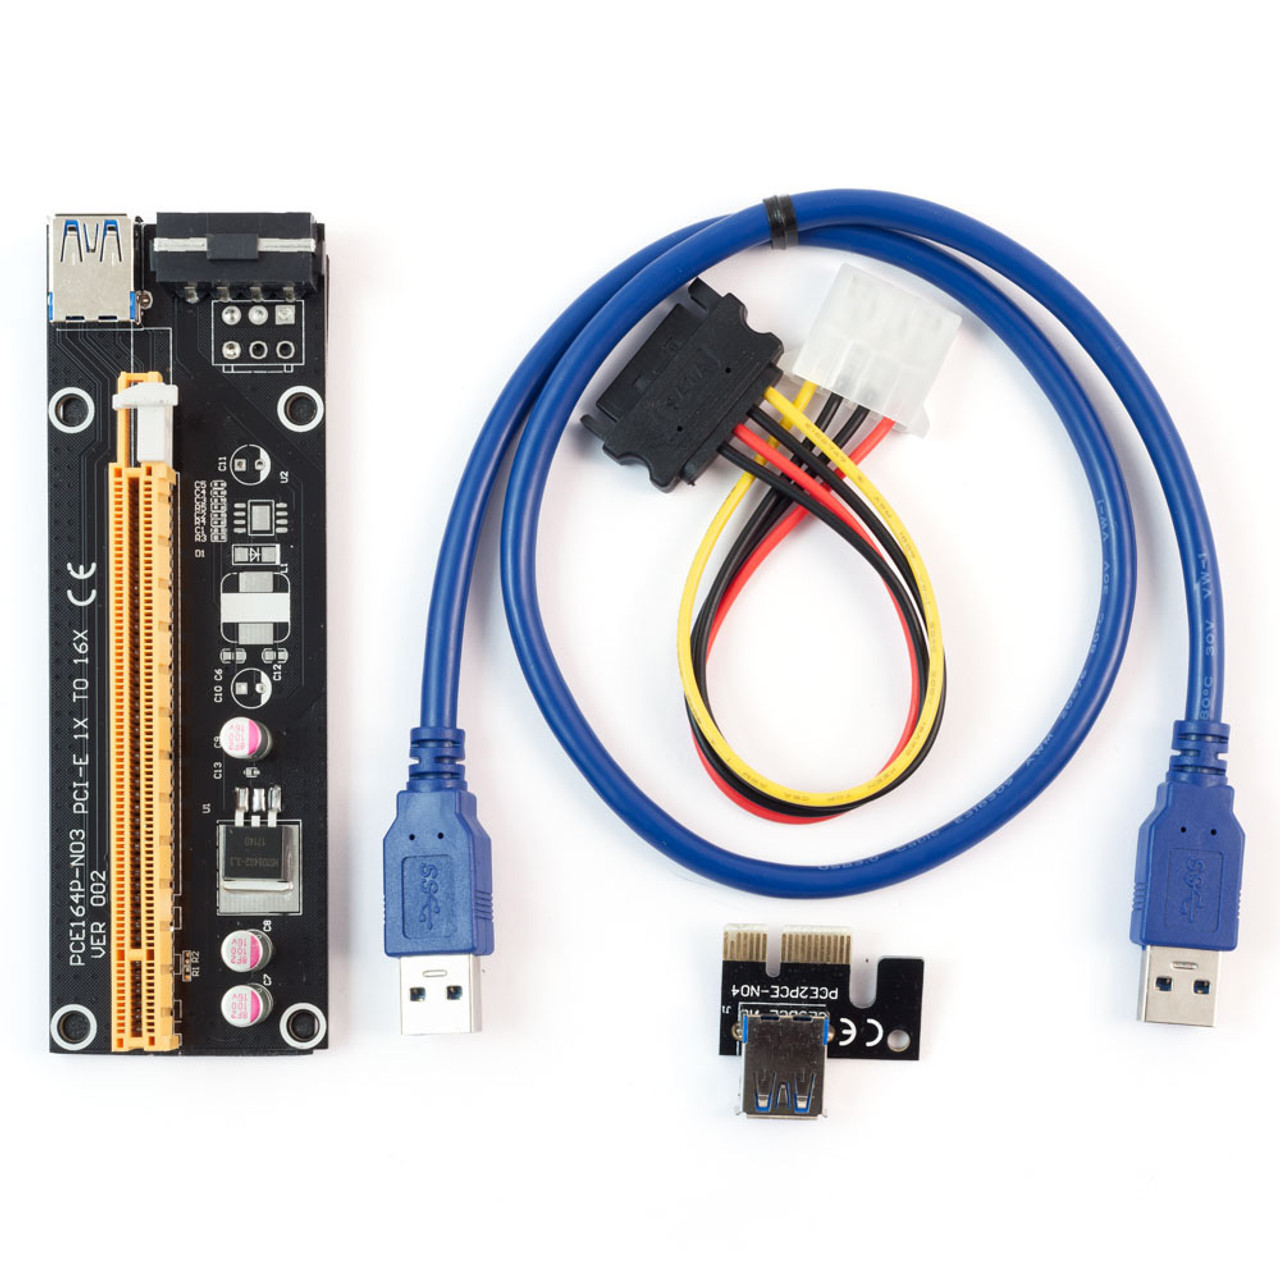 60cm PCI-E Adapter SATA USB 3 0 1x to 16x for Mining 4pin Molex Multi GPU  Riser